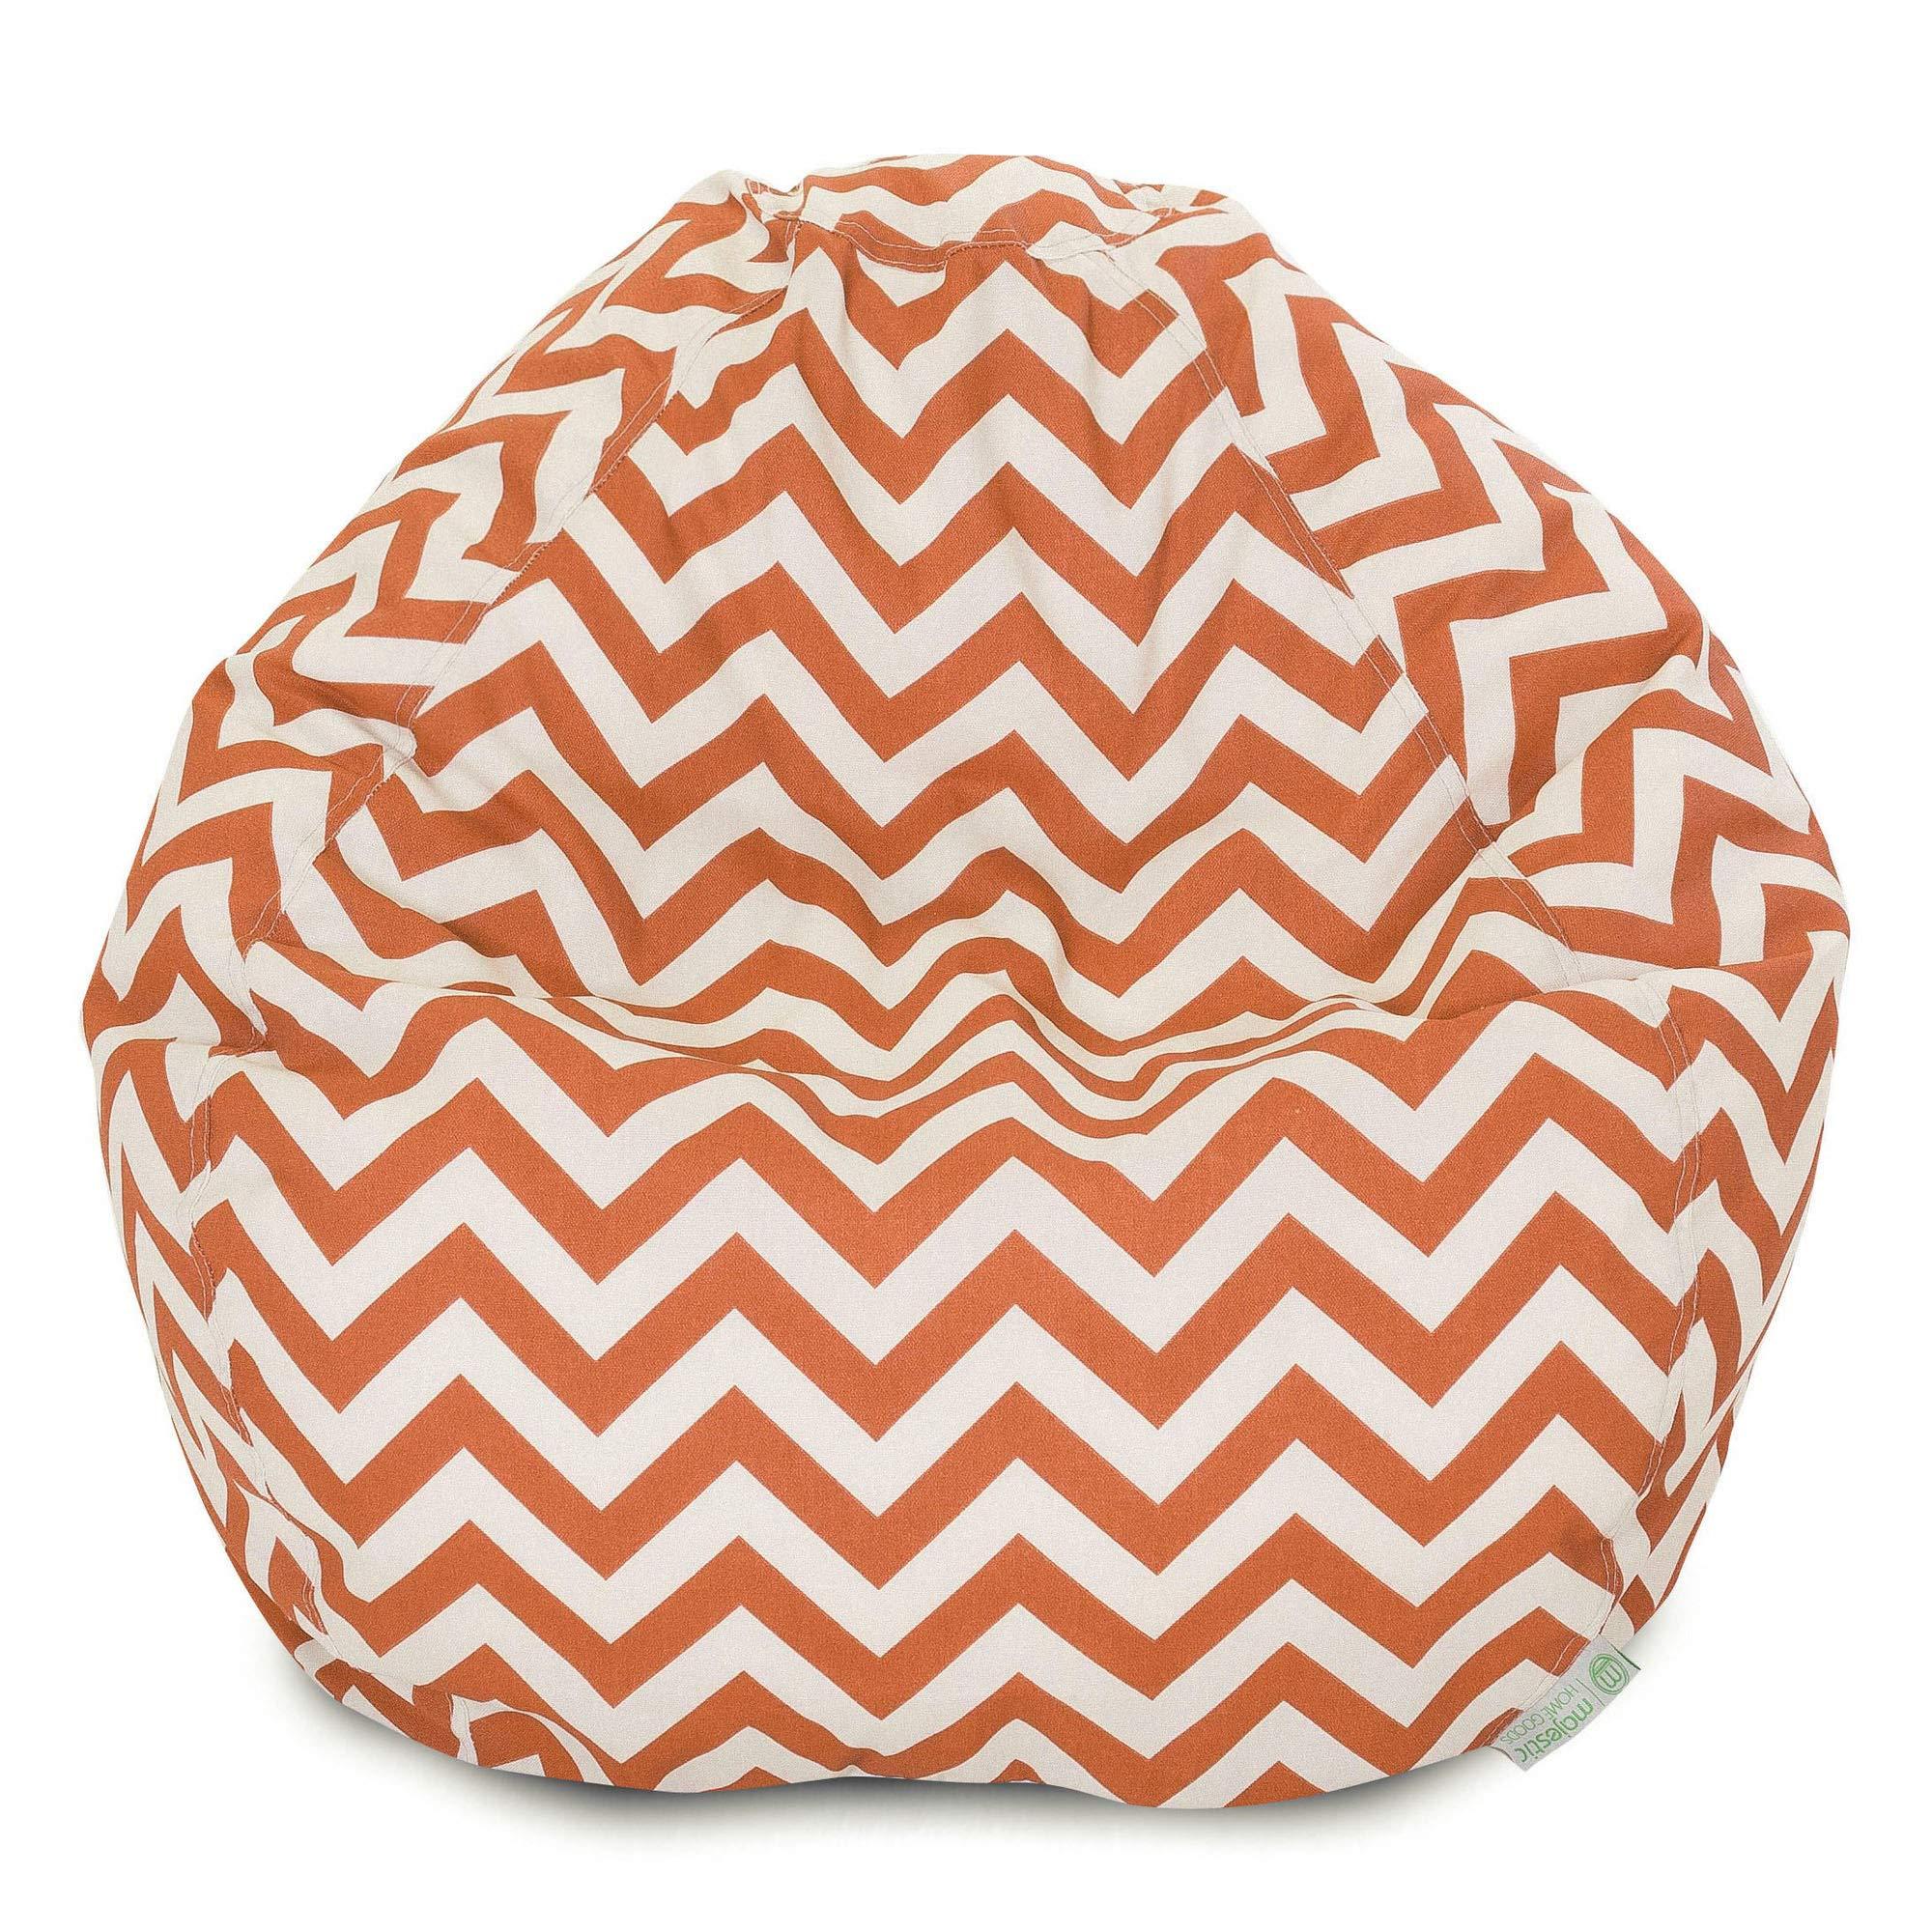 Chair Bag Patterns Free Patterns